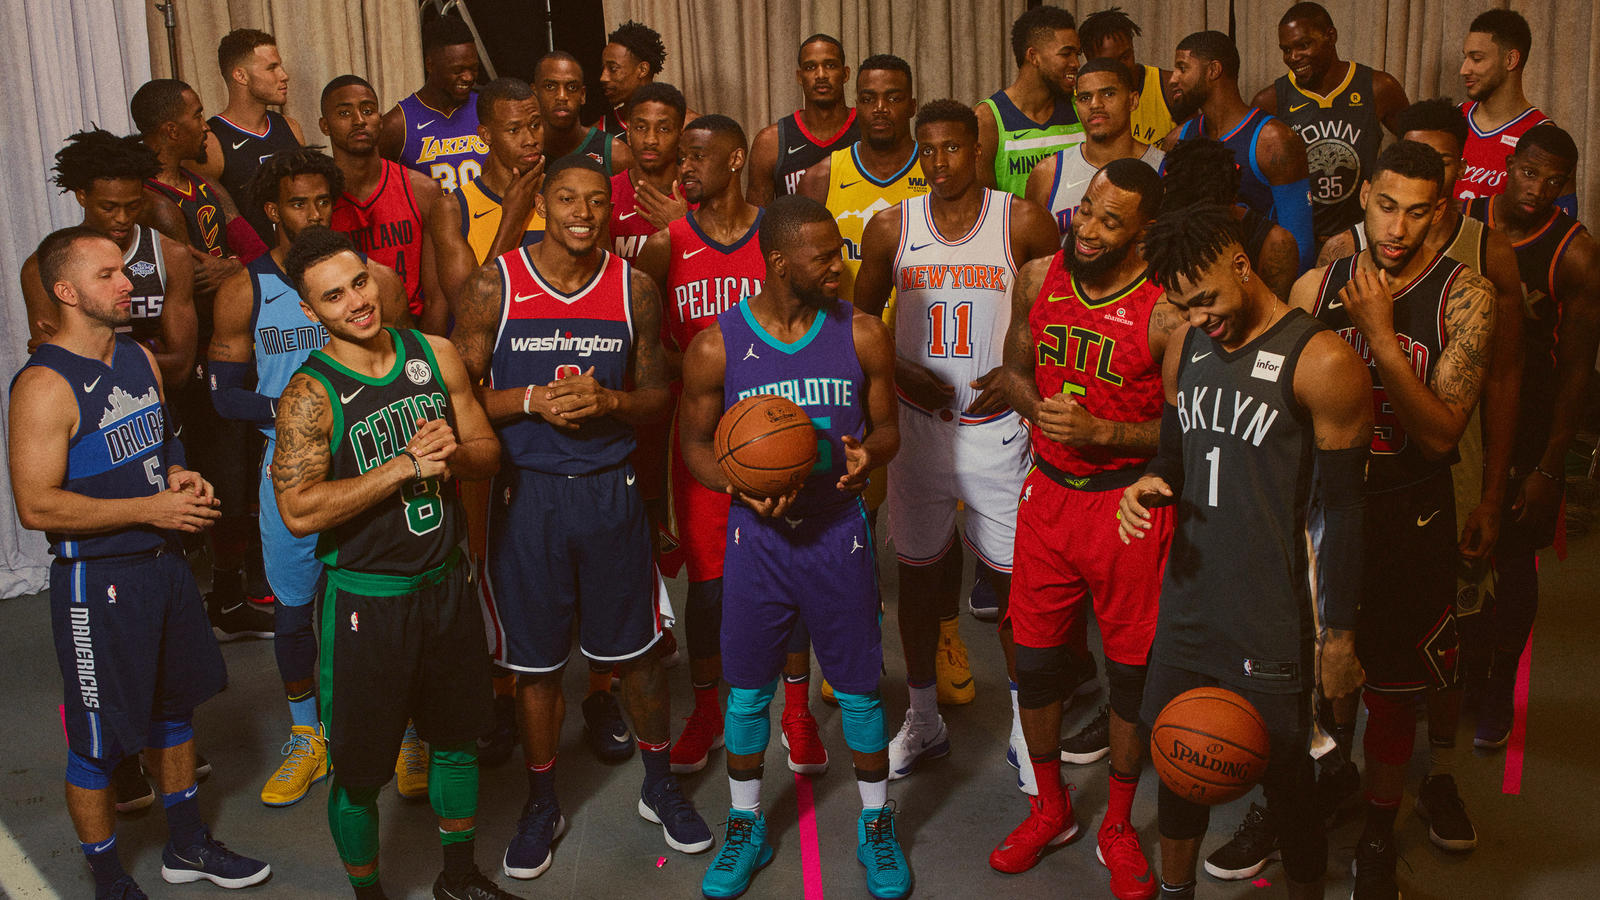 Nike_NBA_Event_Launch_Group_Photo_hd_1600.jpg